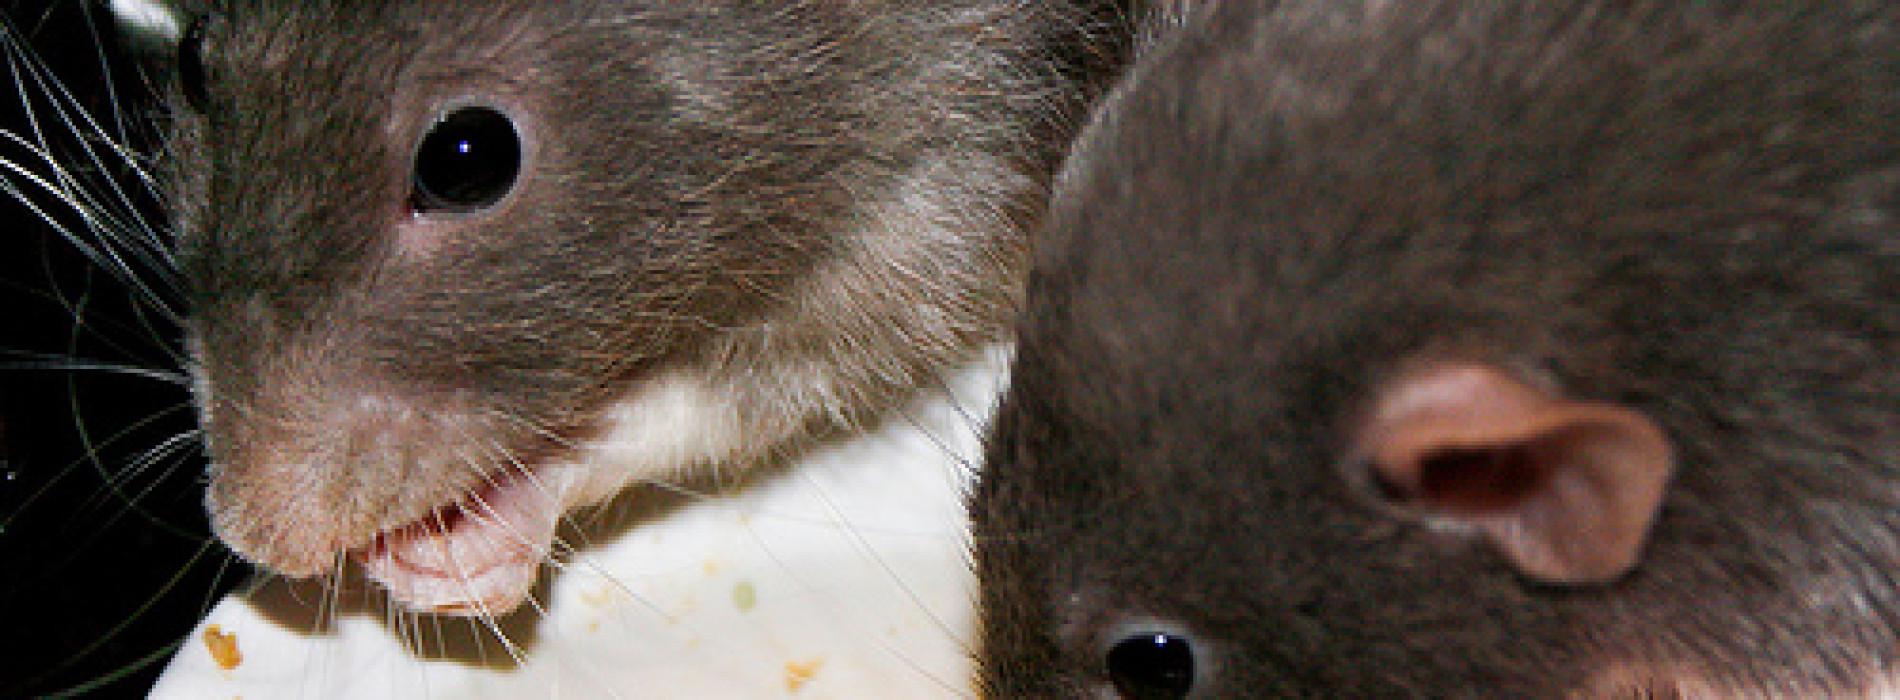 Lassa fever kills doctor in Rivers state